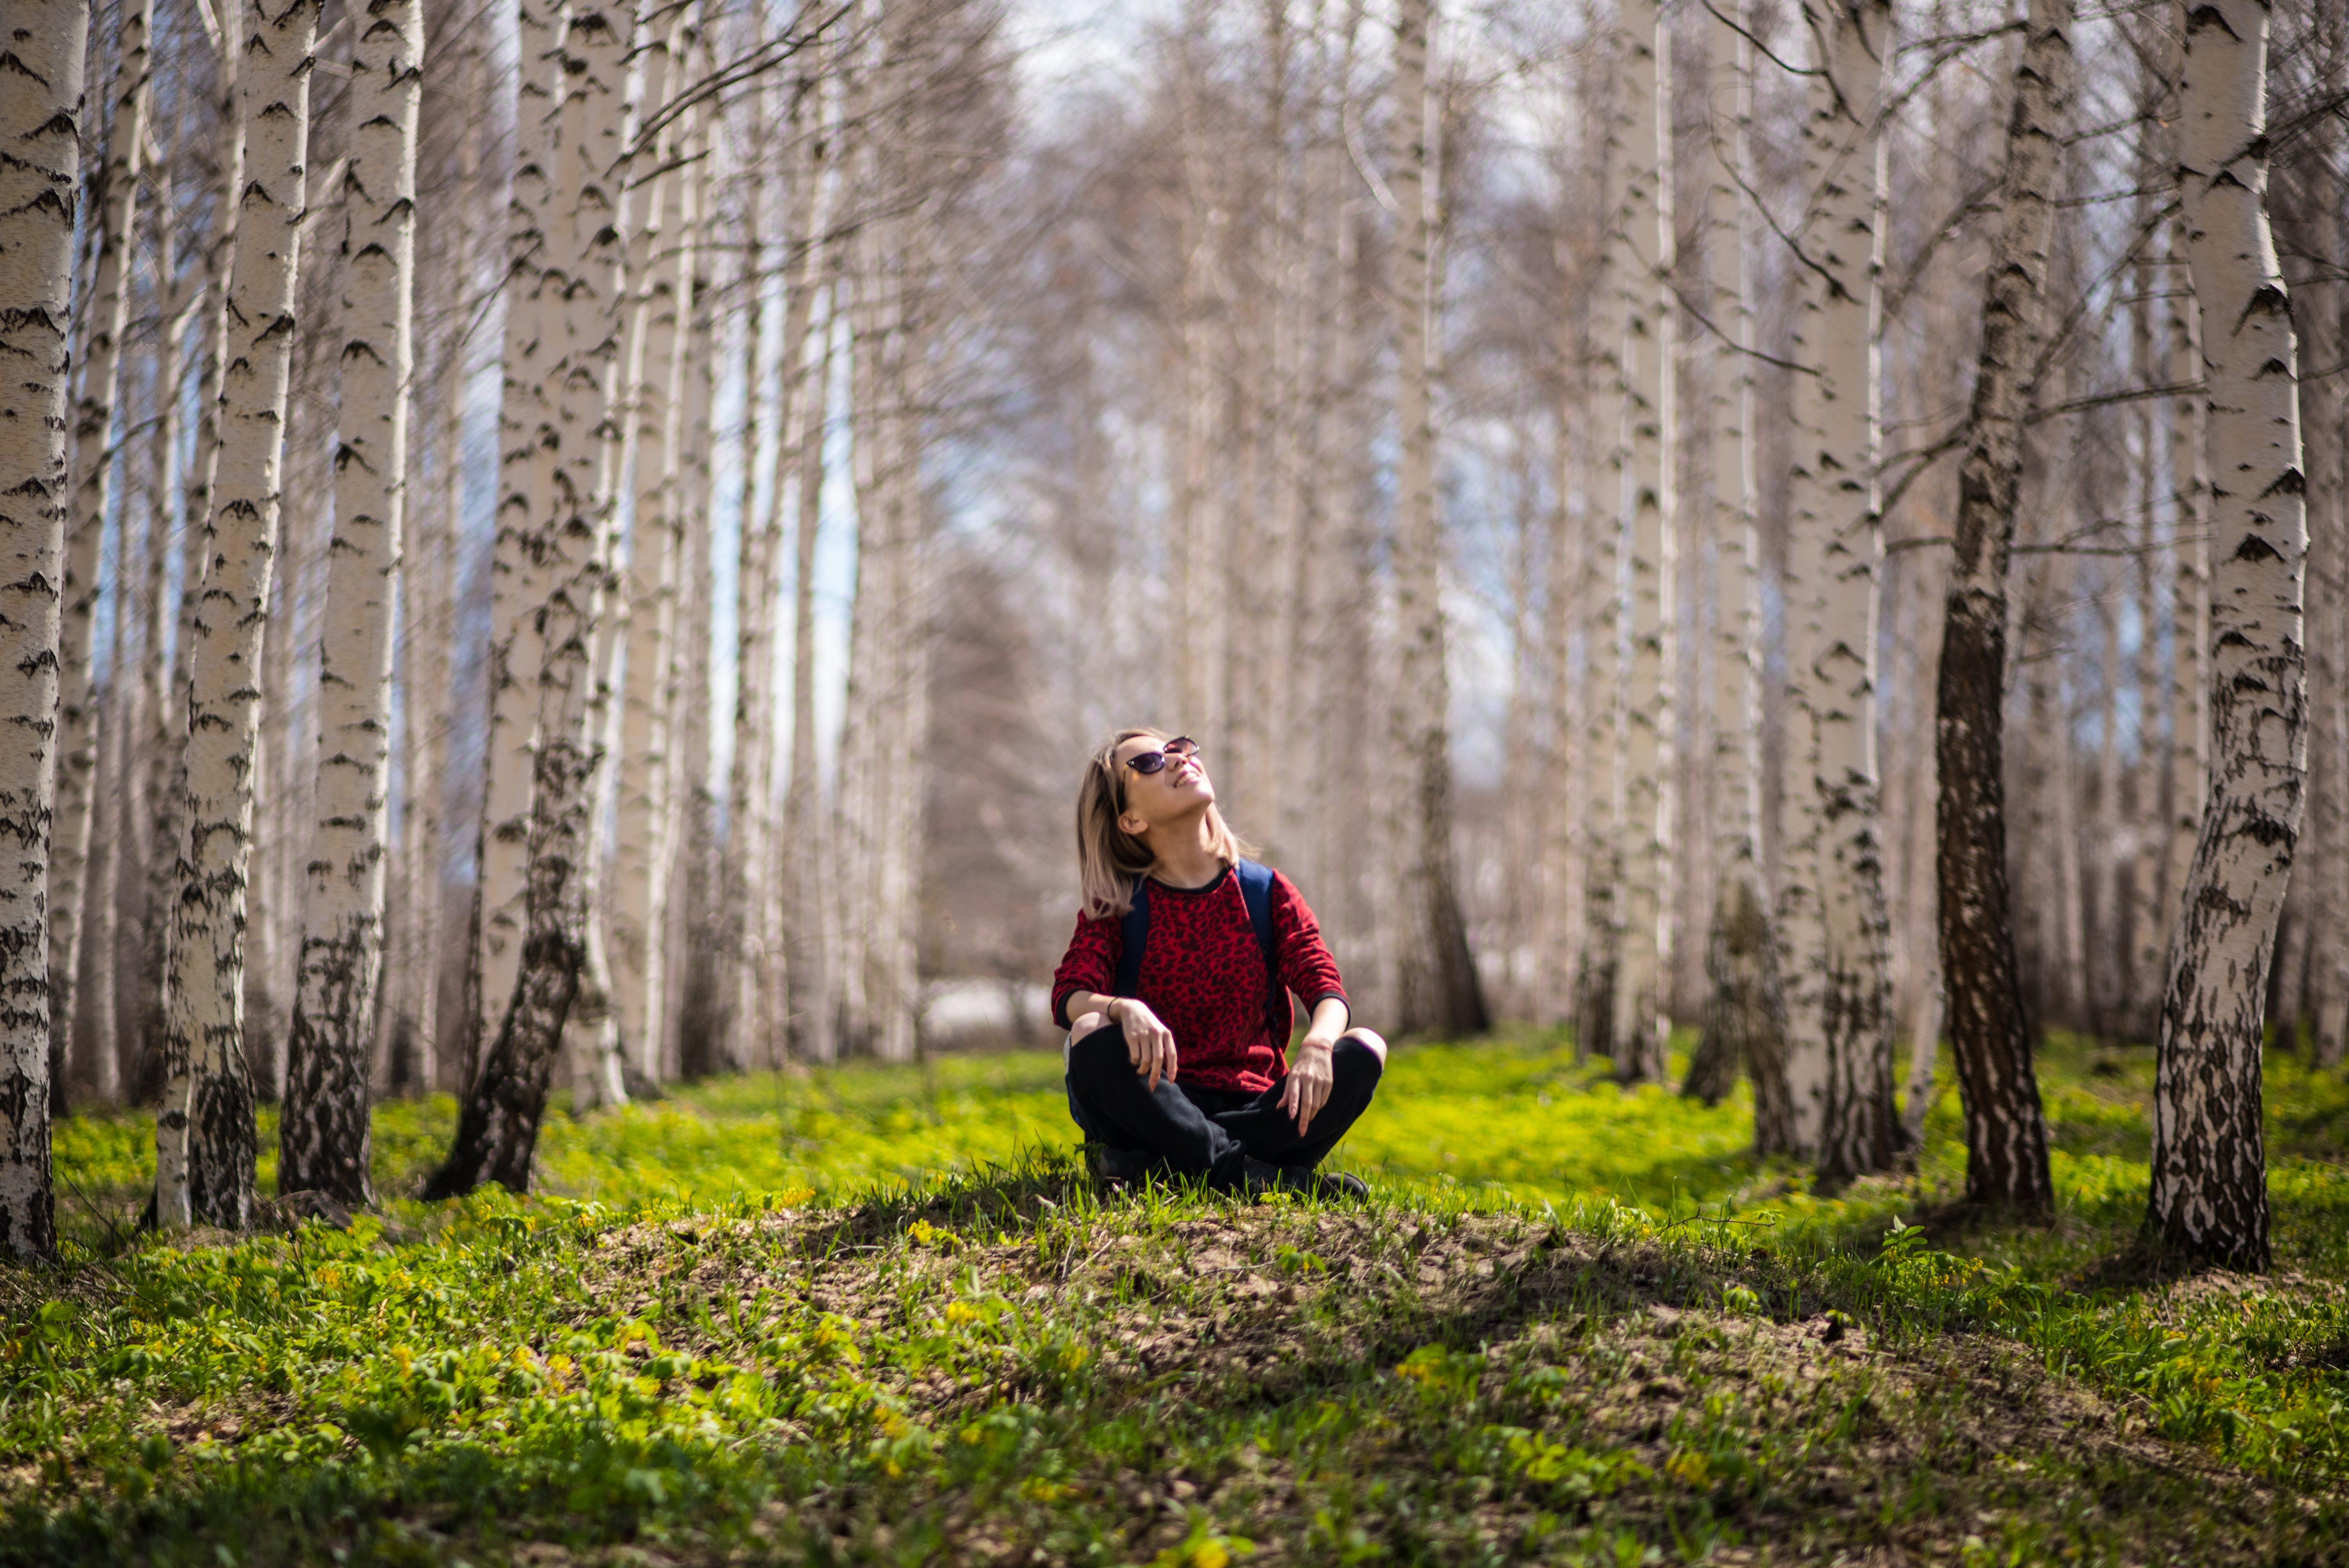 blur, branch, countryside